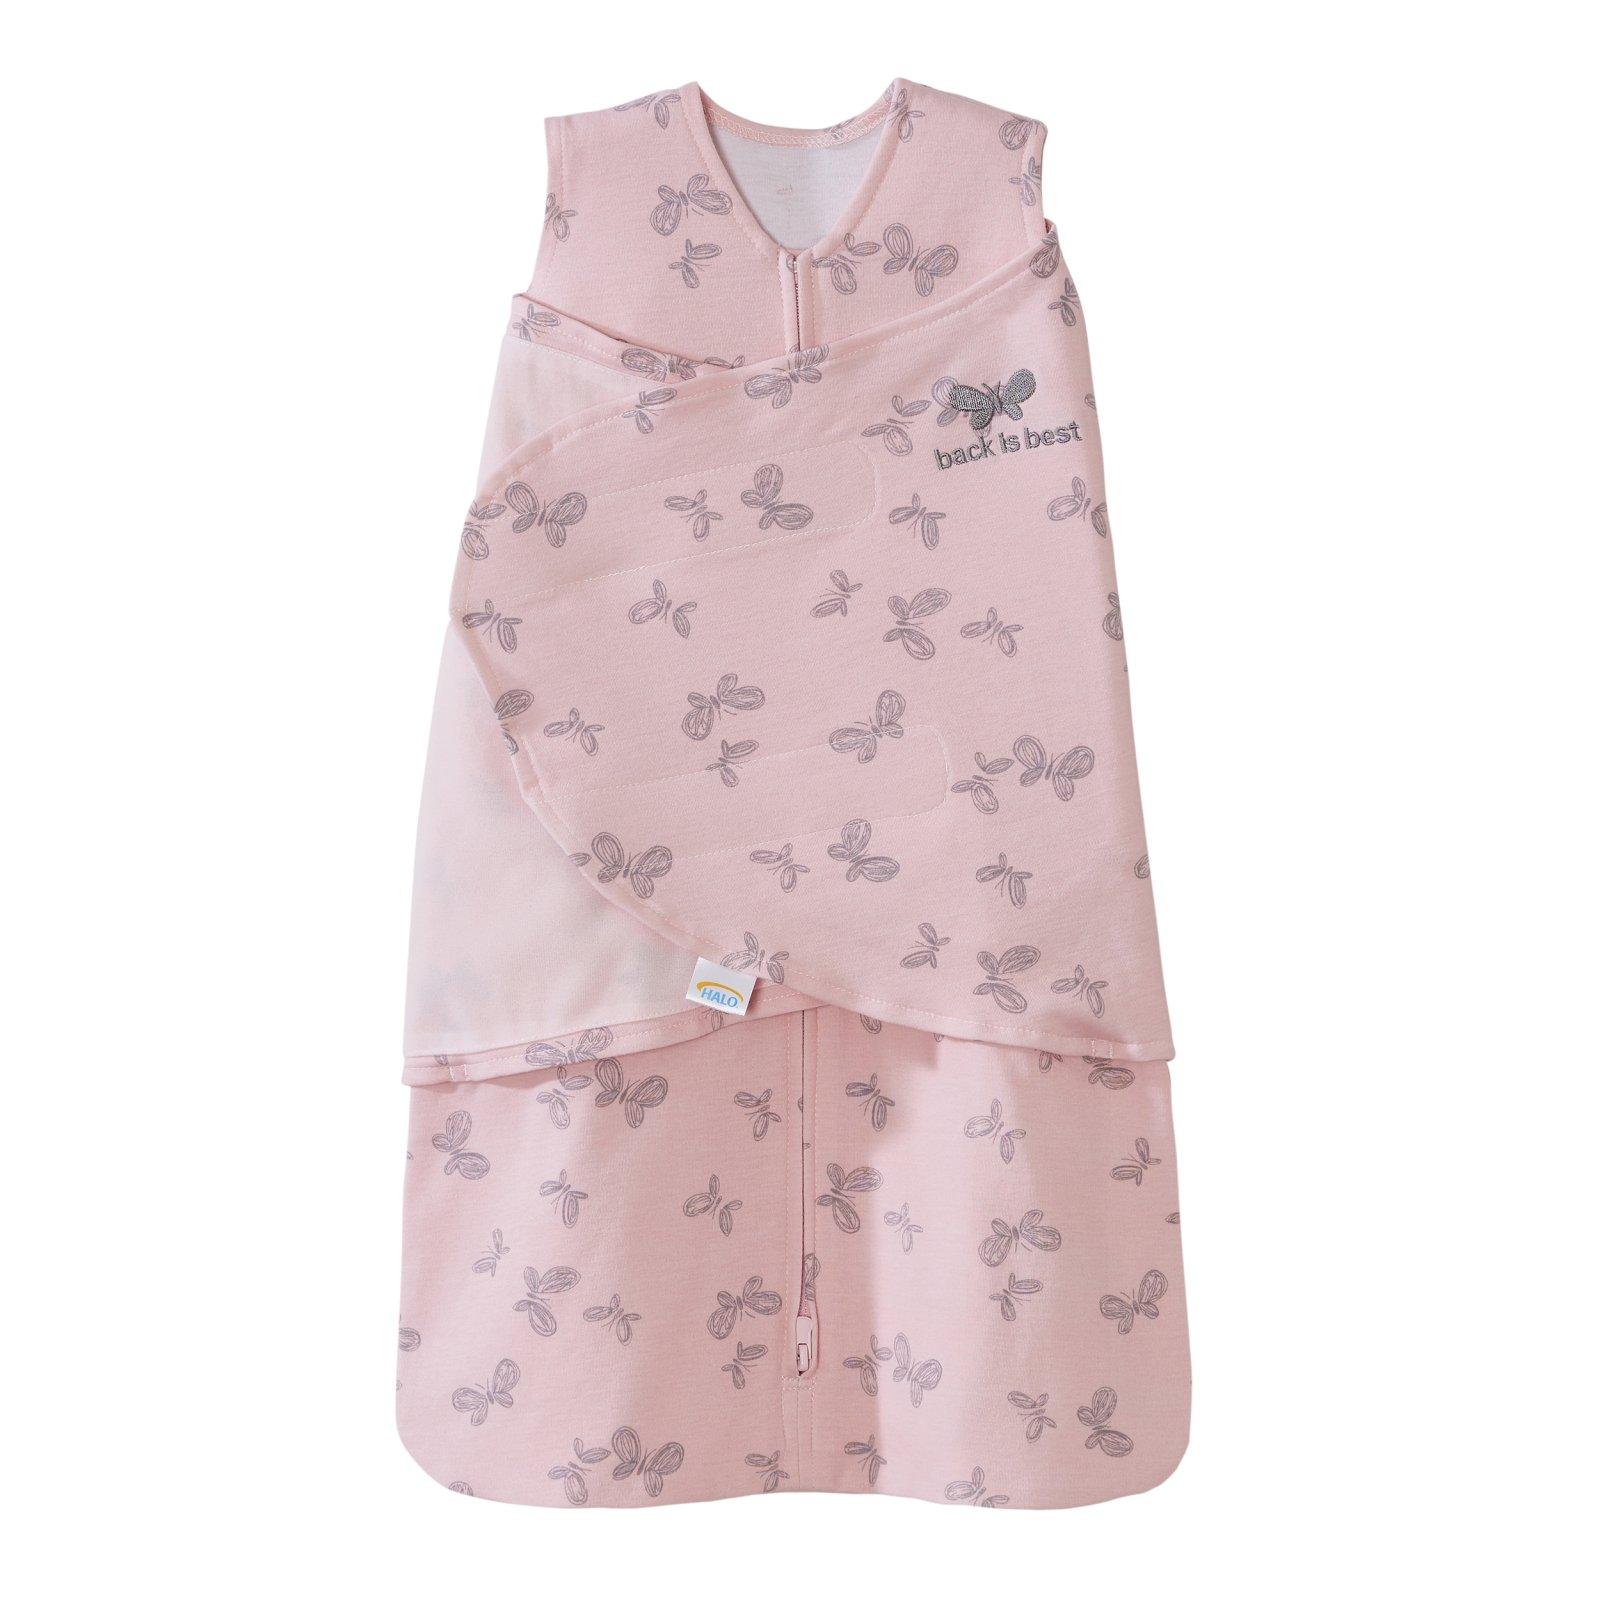 HALO SleepSack Swaddle cotton pink butterfly scribble nb